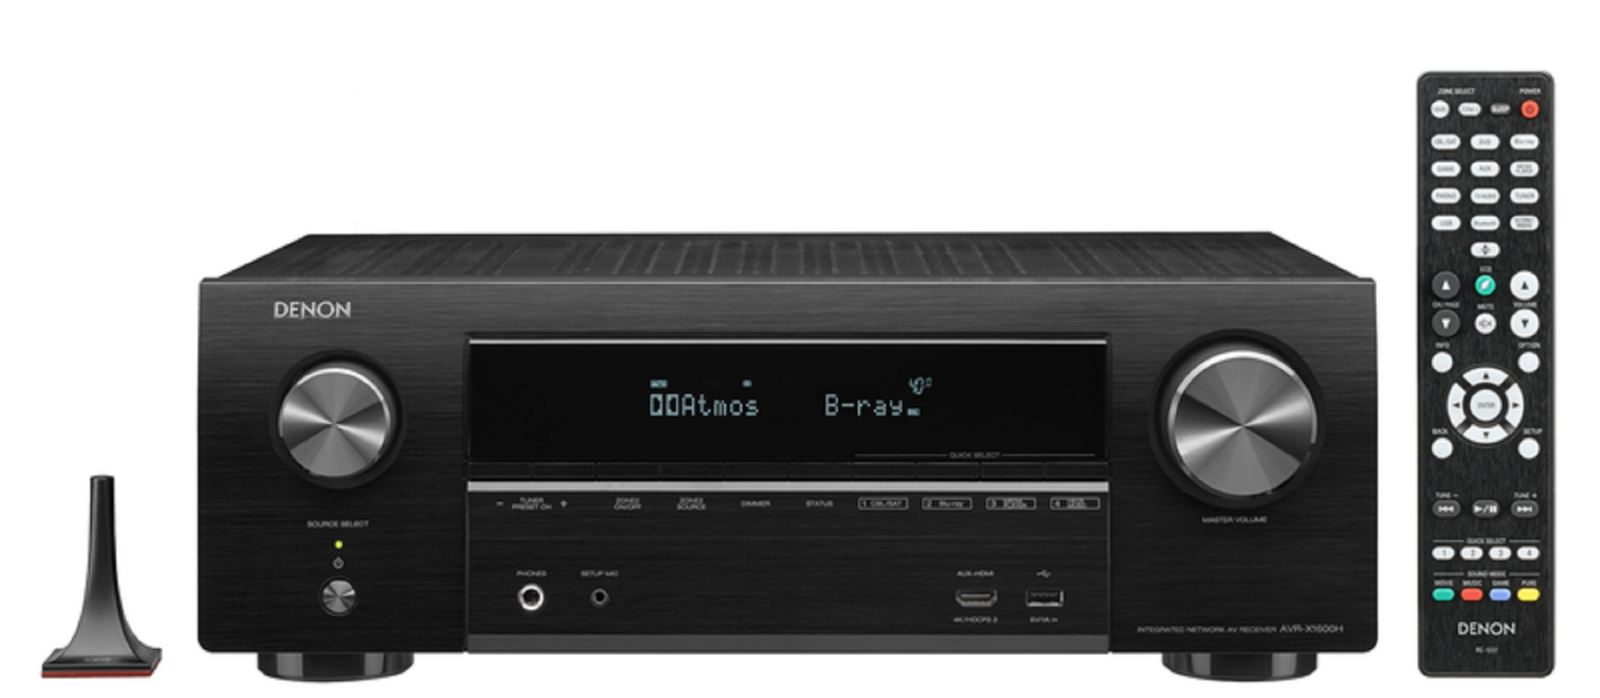 Denon ra mắt2 AV Receiver mới:AVR-X2600H và AVR-X1600H